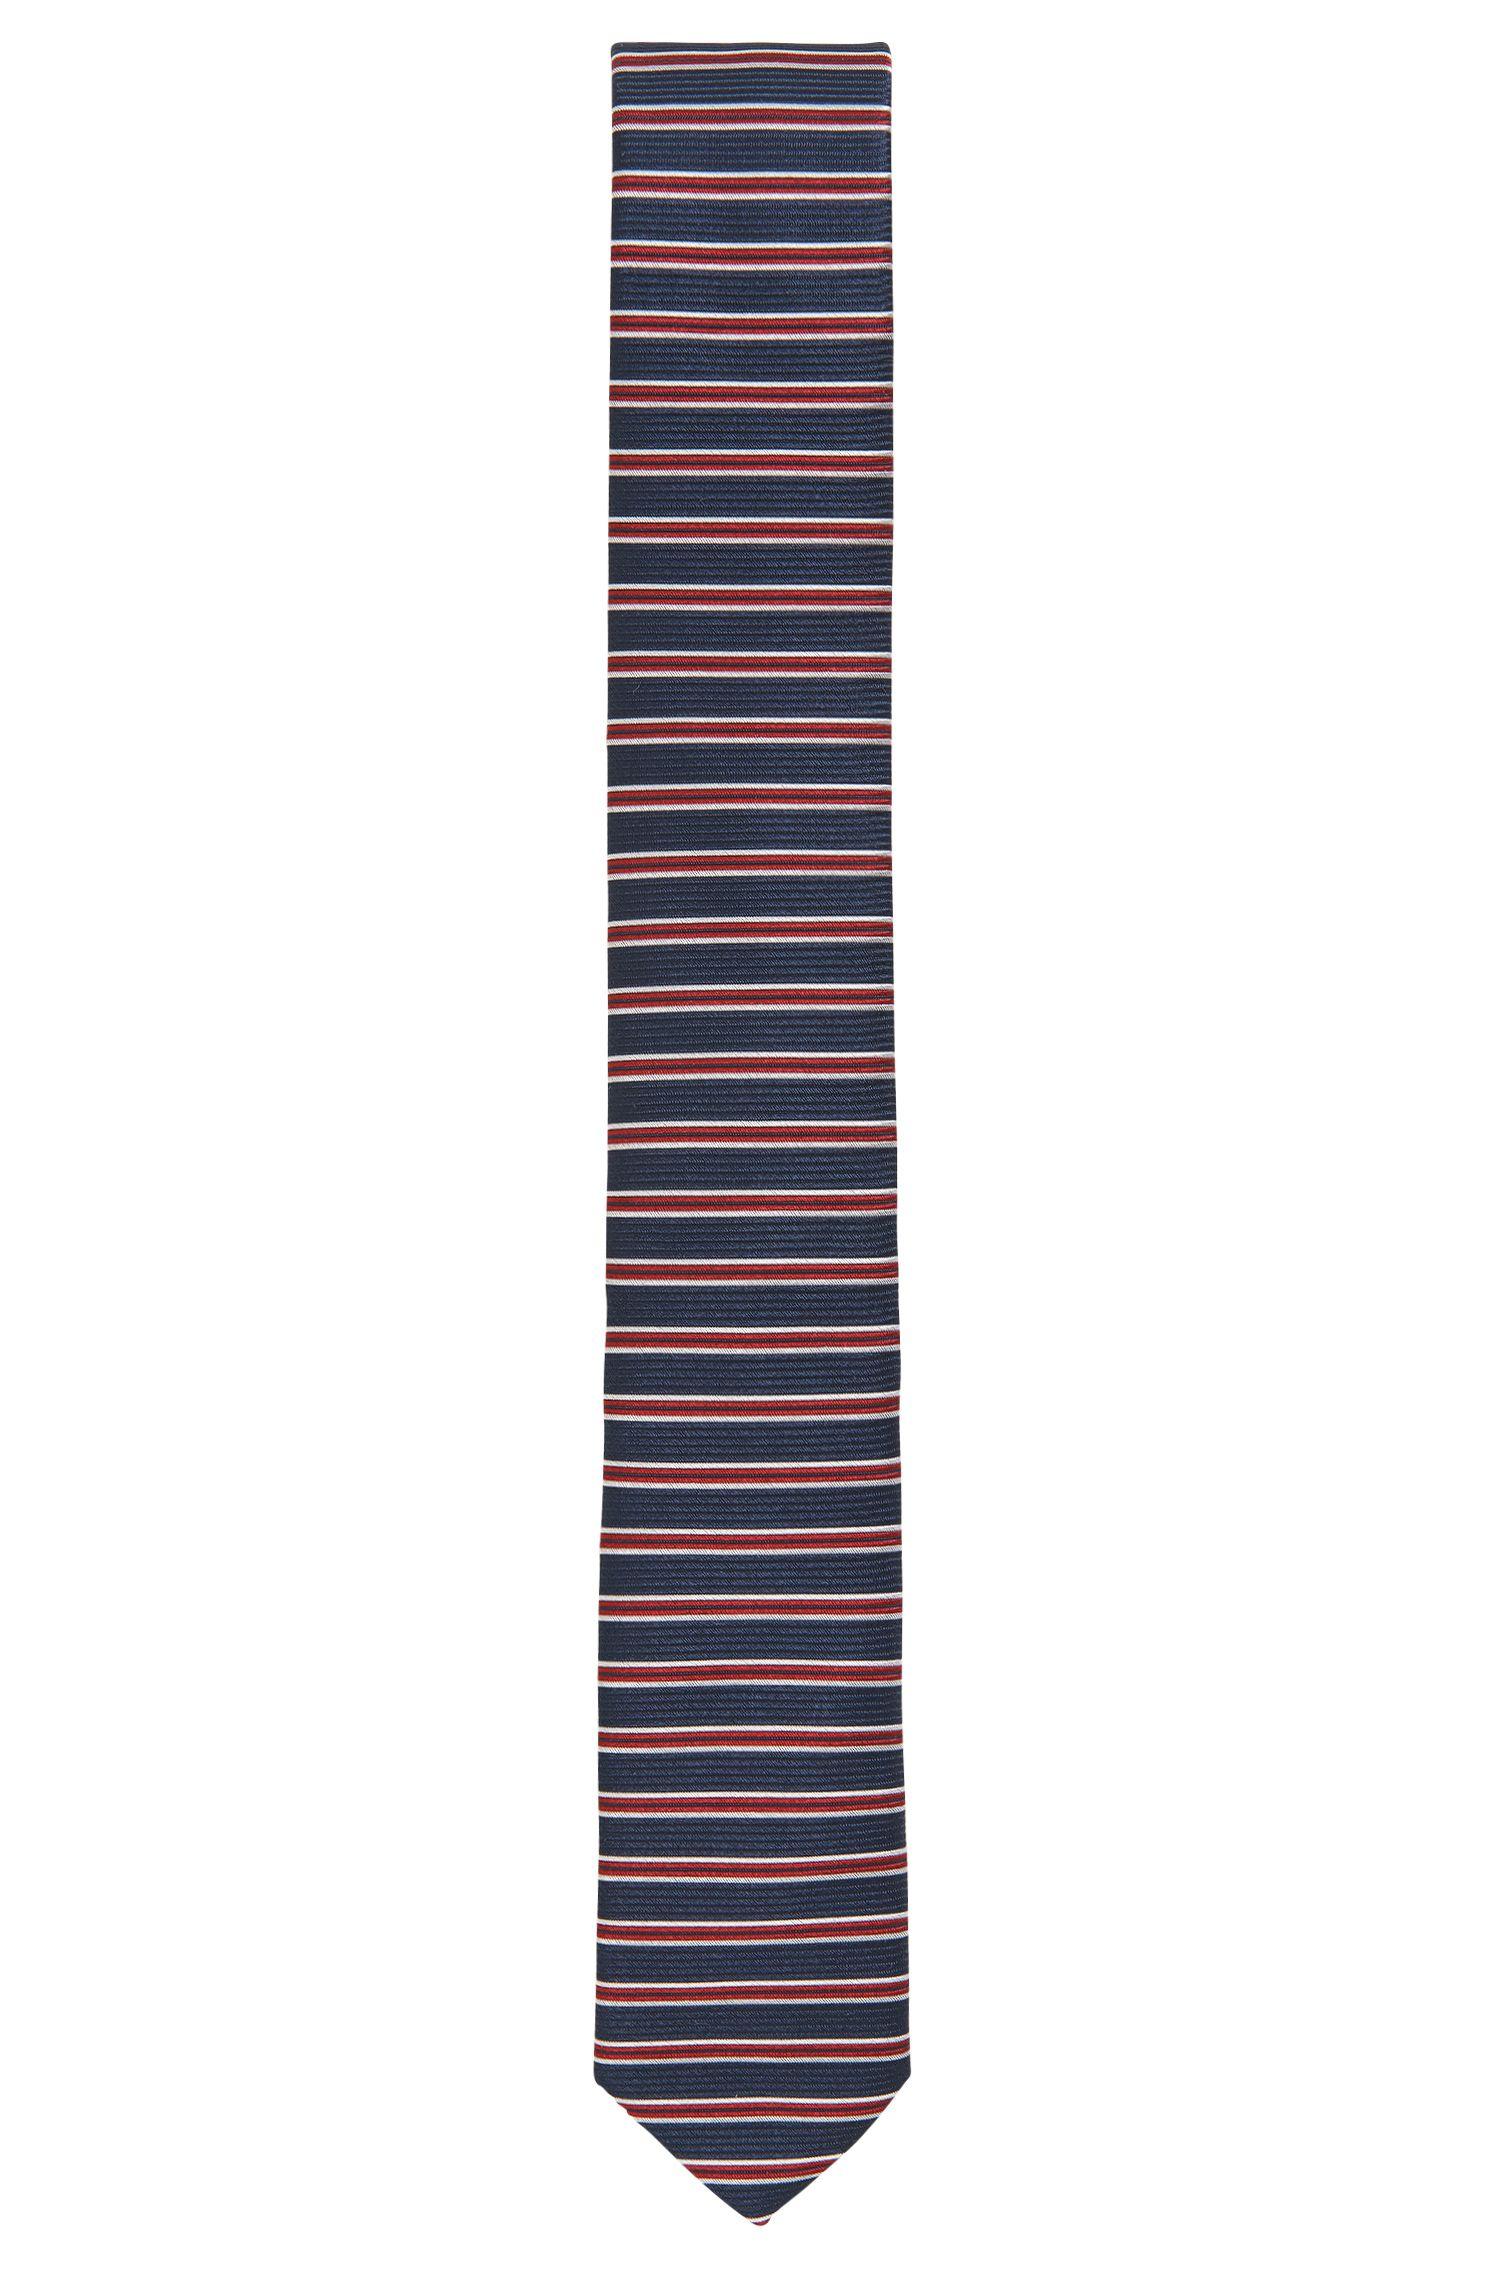 Striped Silk Tie, Slim | Tie 6 cm